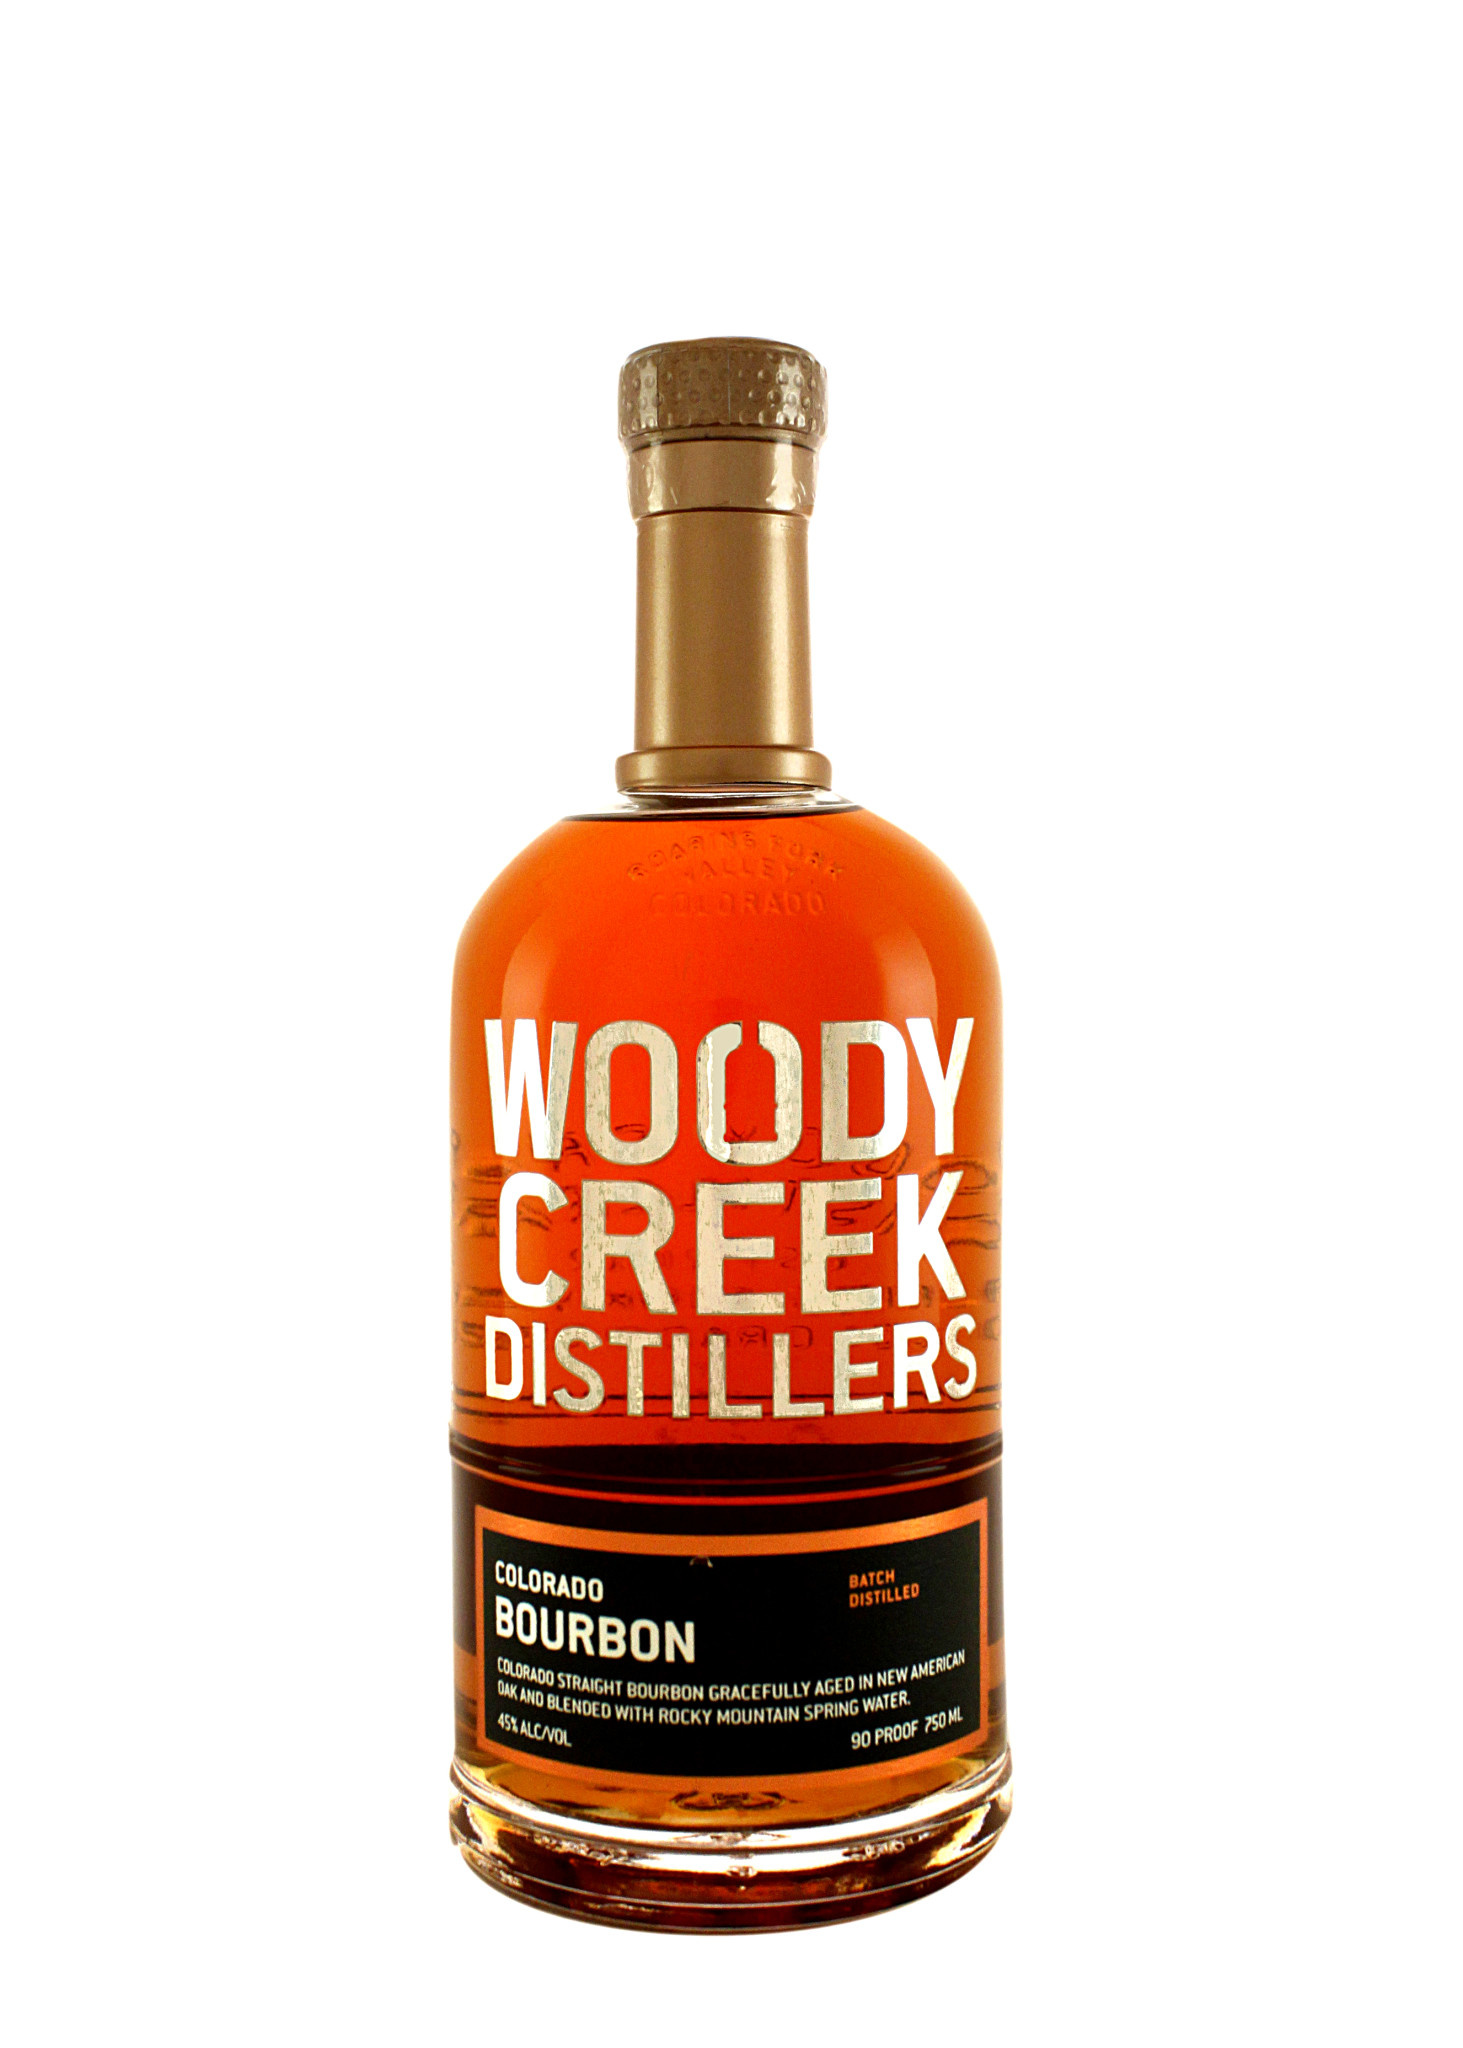 Woody Creek Straight Bourbon, Colorado